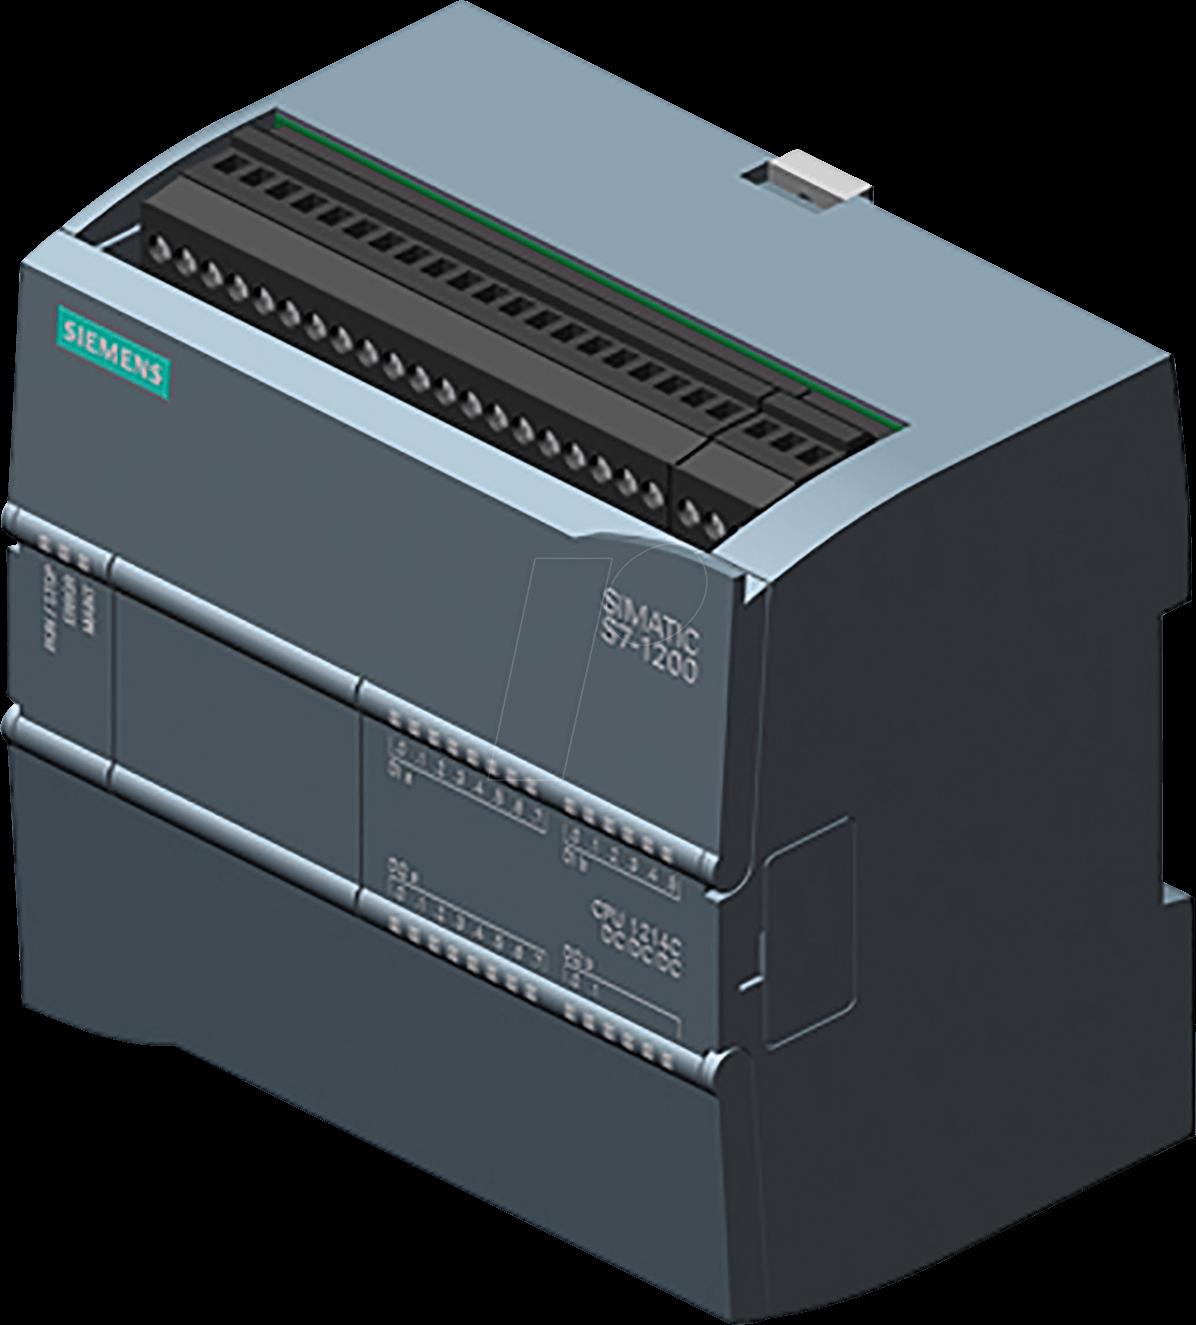 S7 1214c Dc  Simatic S7-1200